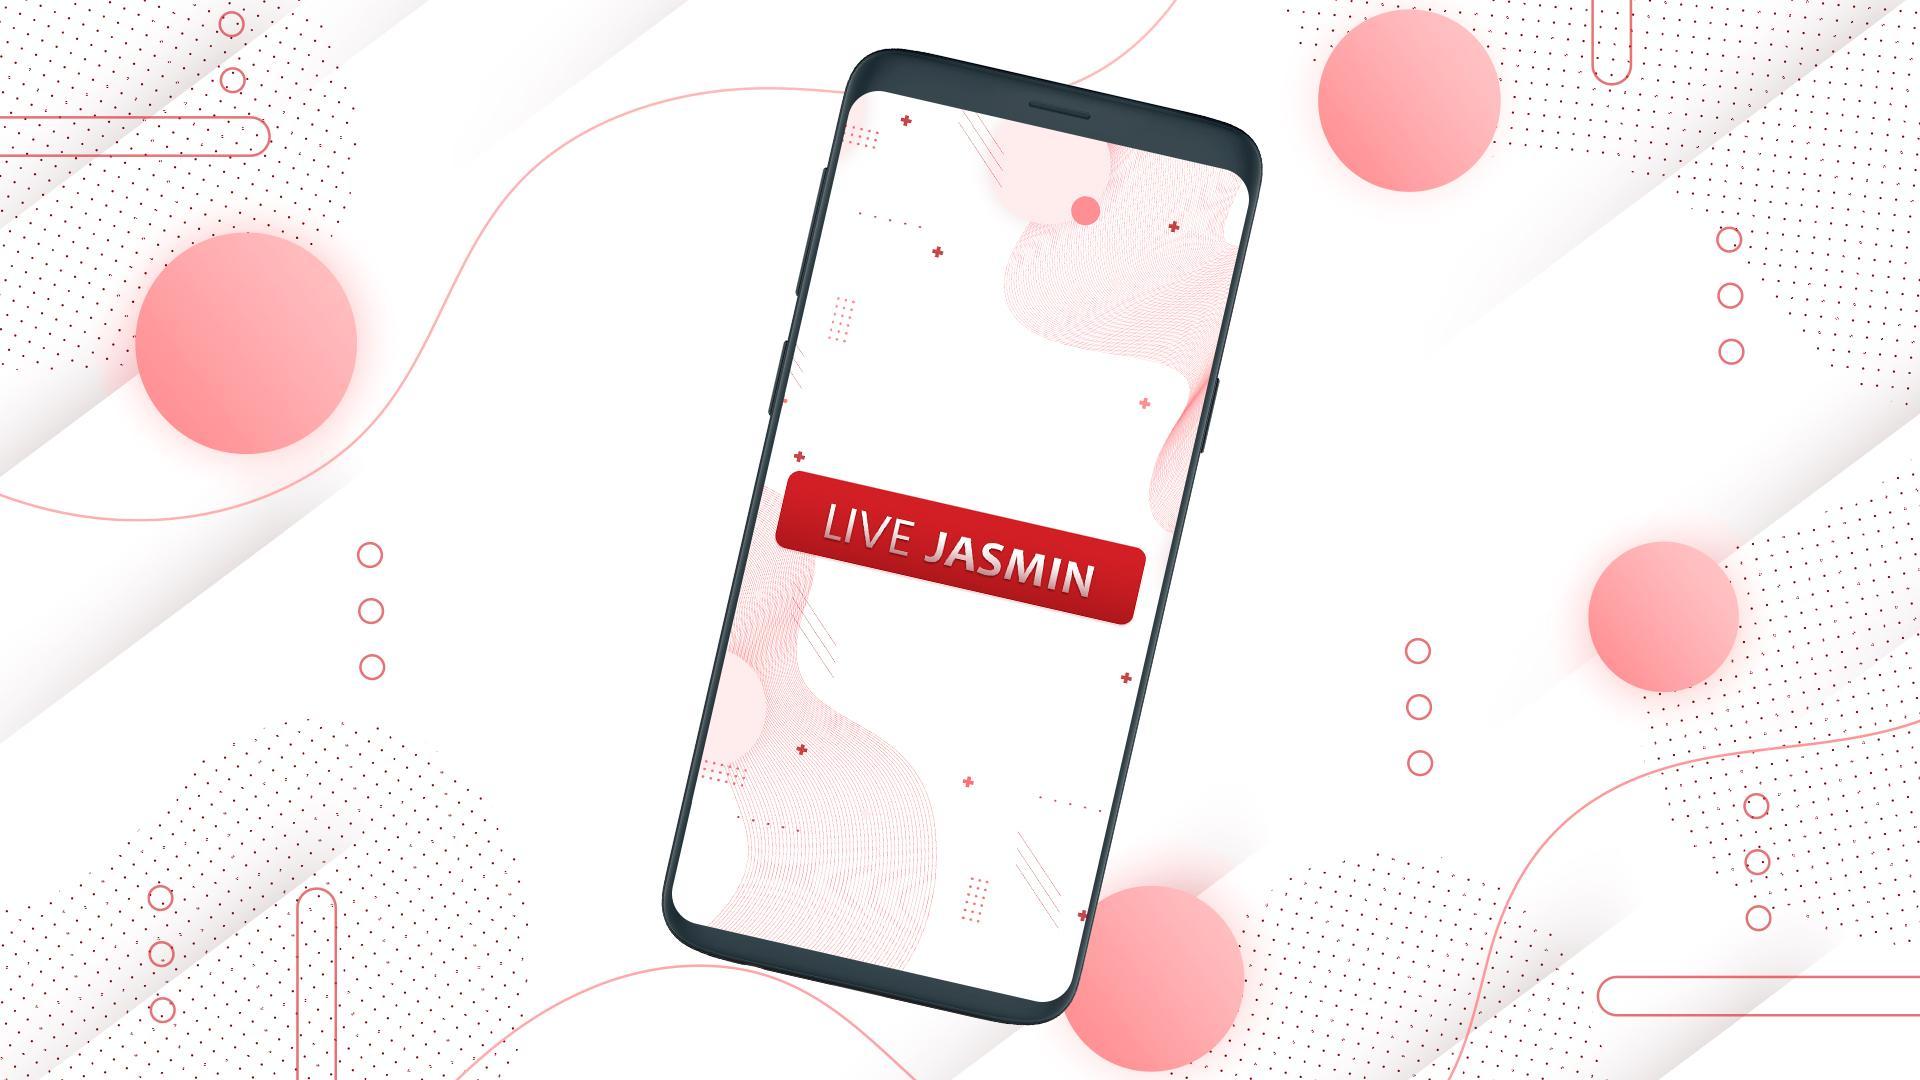 App livejasmin Mobile App